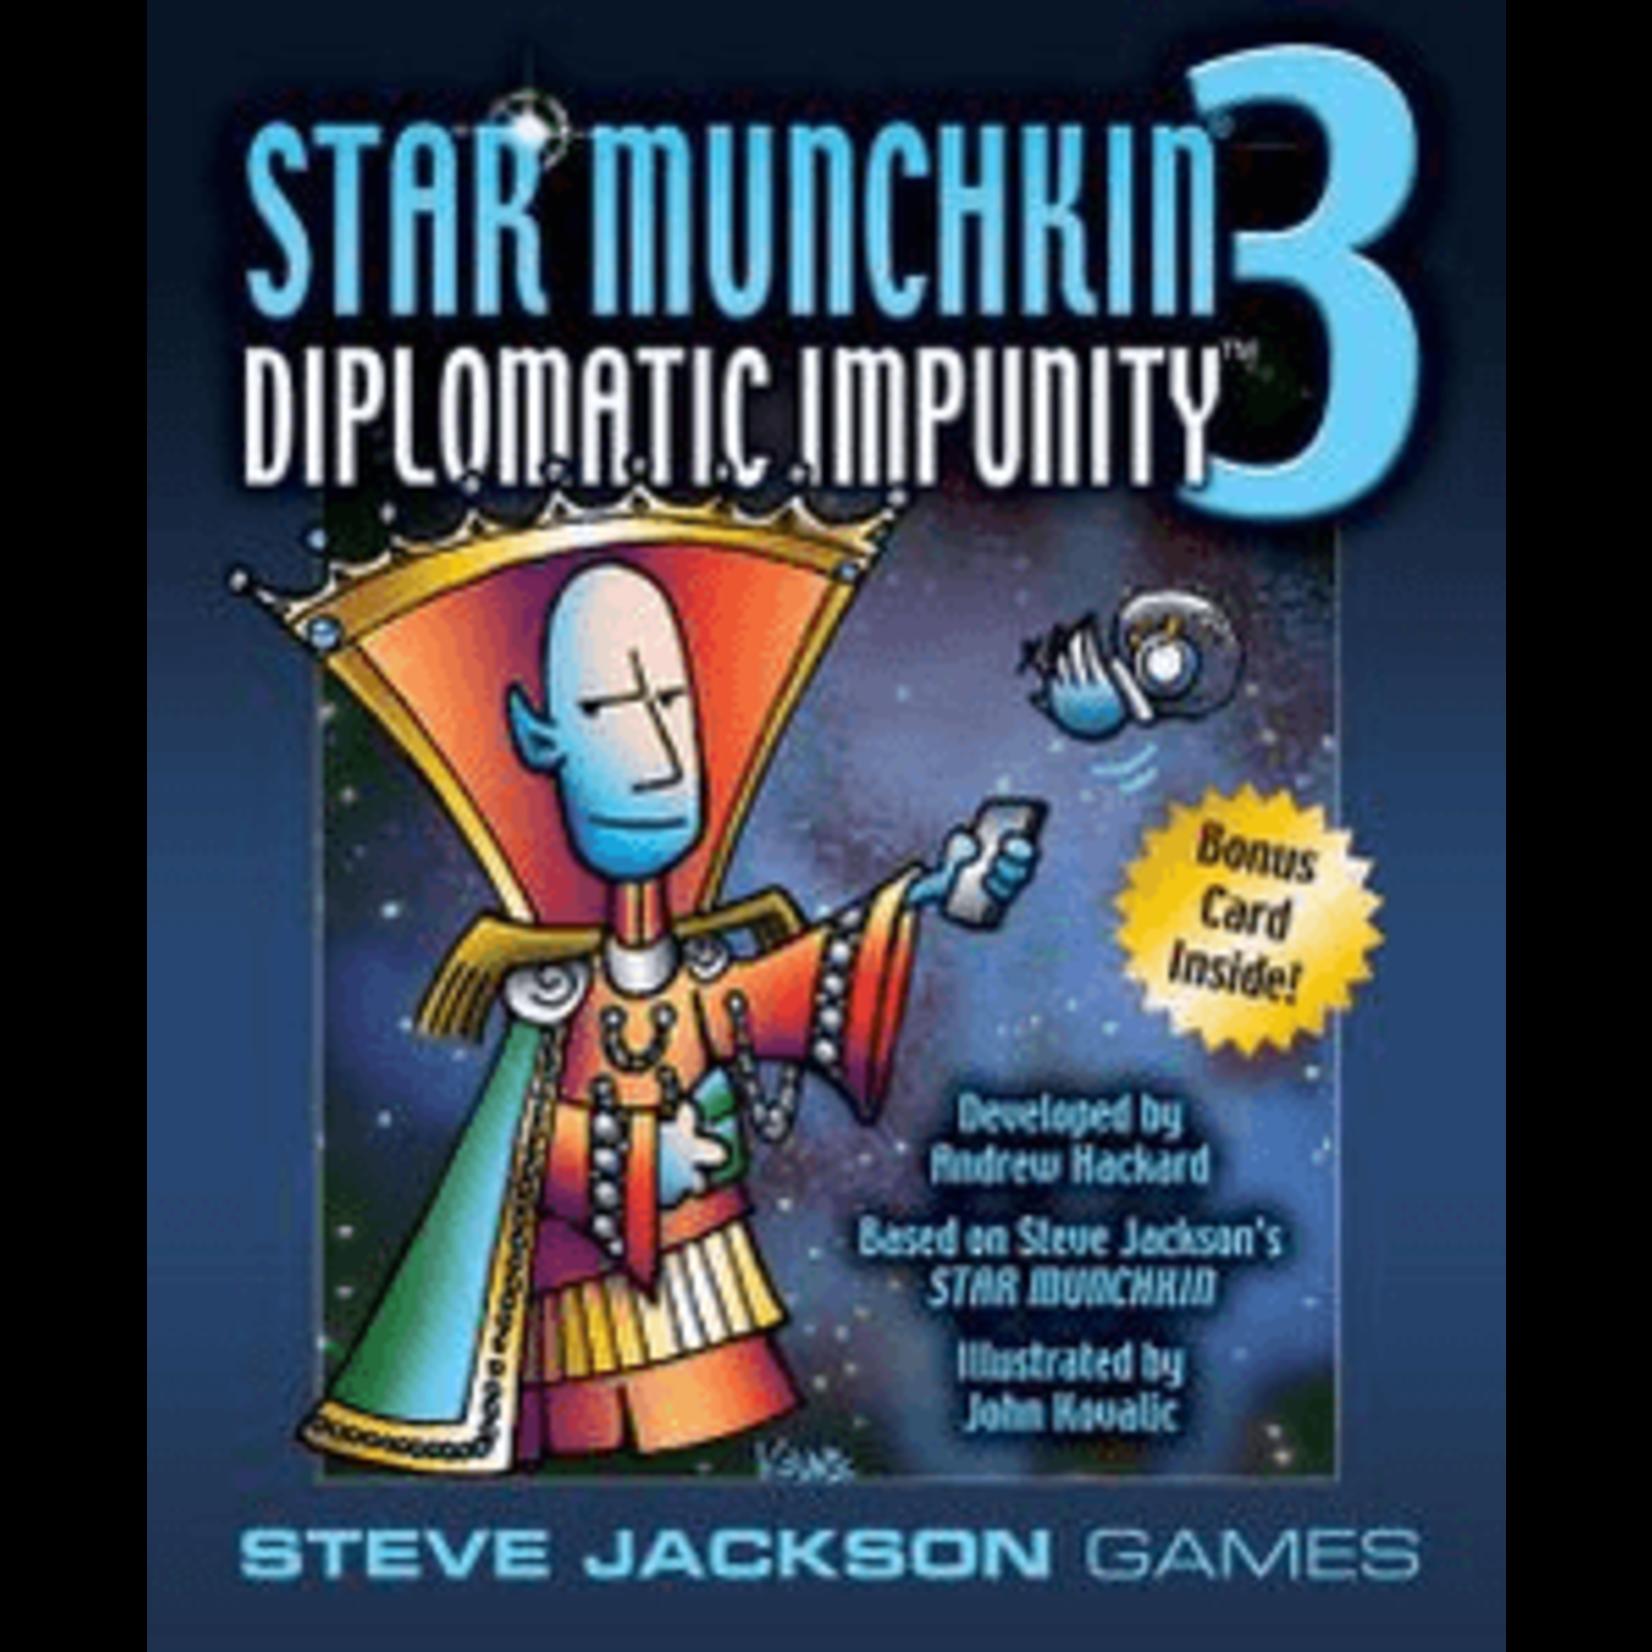 Steve Jackson Games Munchkin Star 3: Diplomatic Impunity